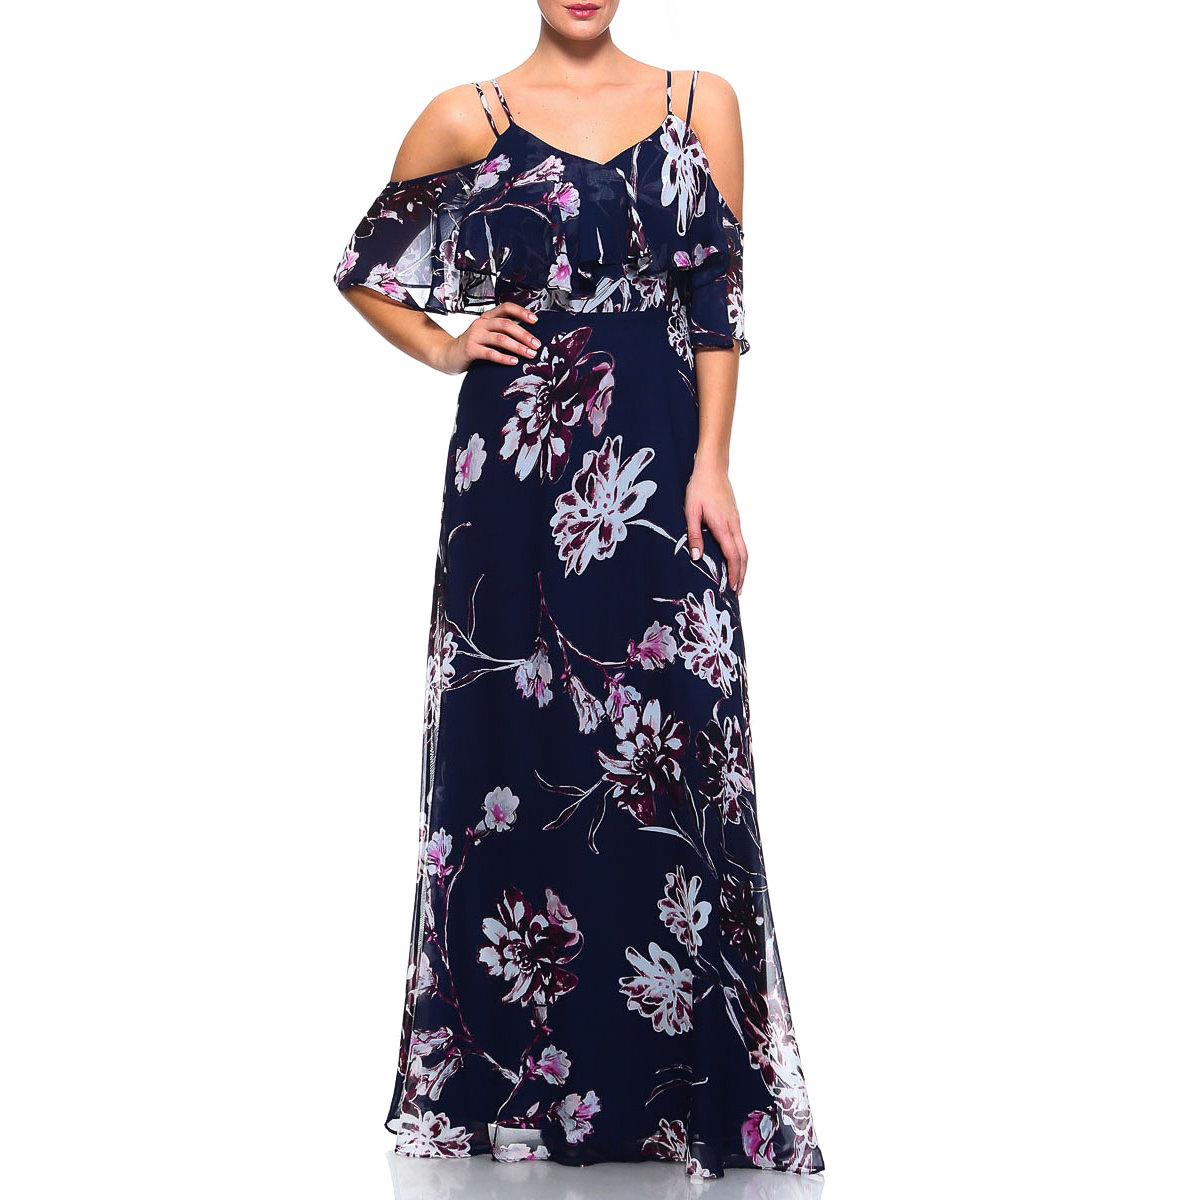 Purple and grey maxi dress